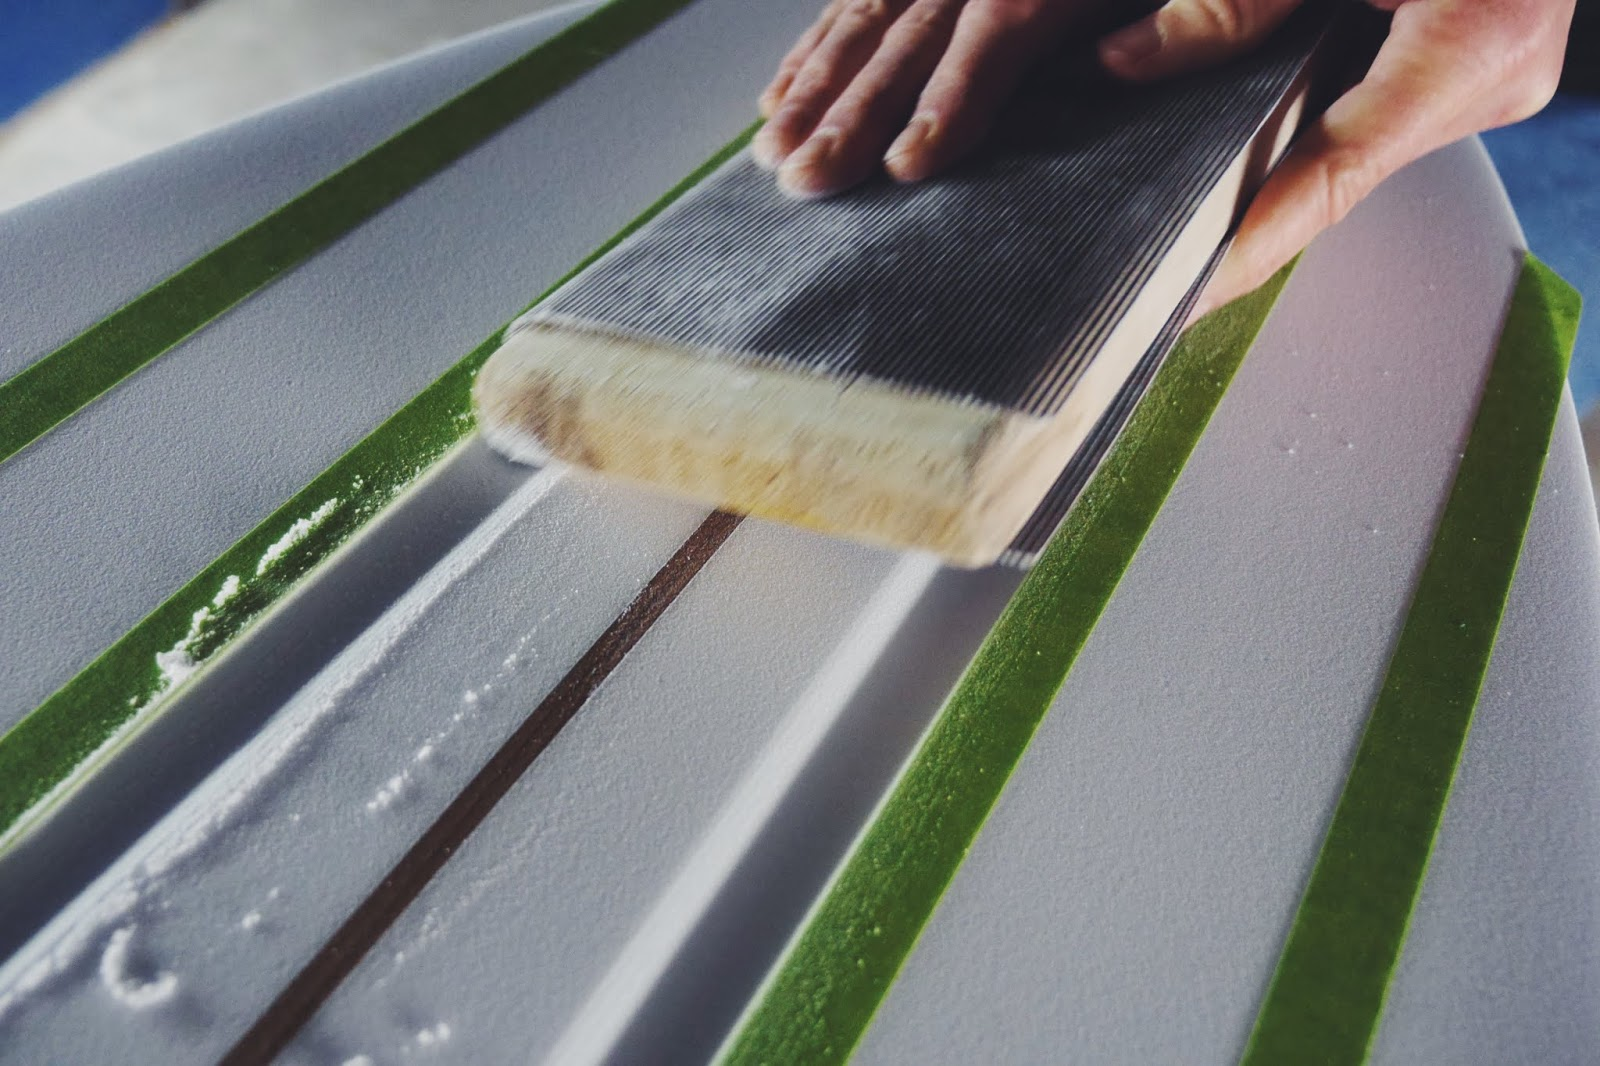 surfinestate brand clothing apparel shape surf design surfboard Hossegor France coronavirus staysafe Vincent Lemanceau Arthur Nelli